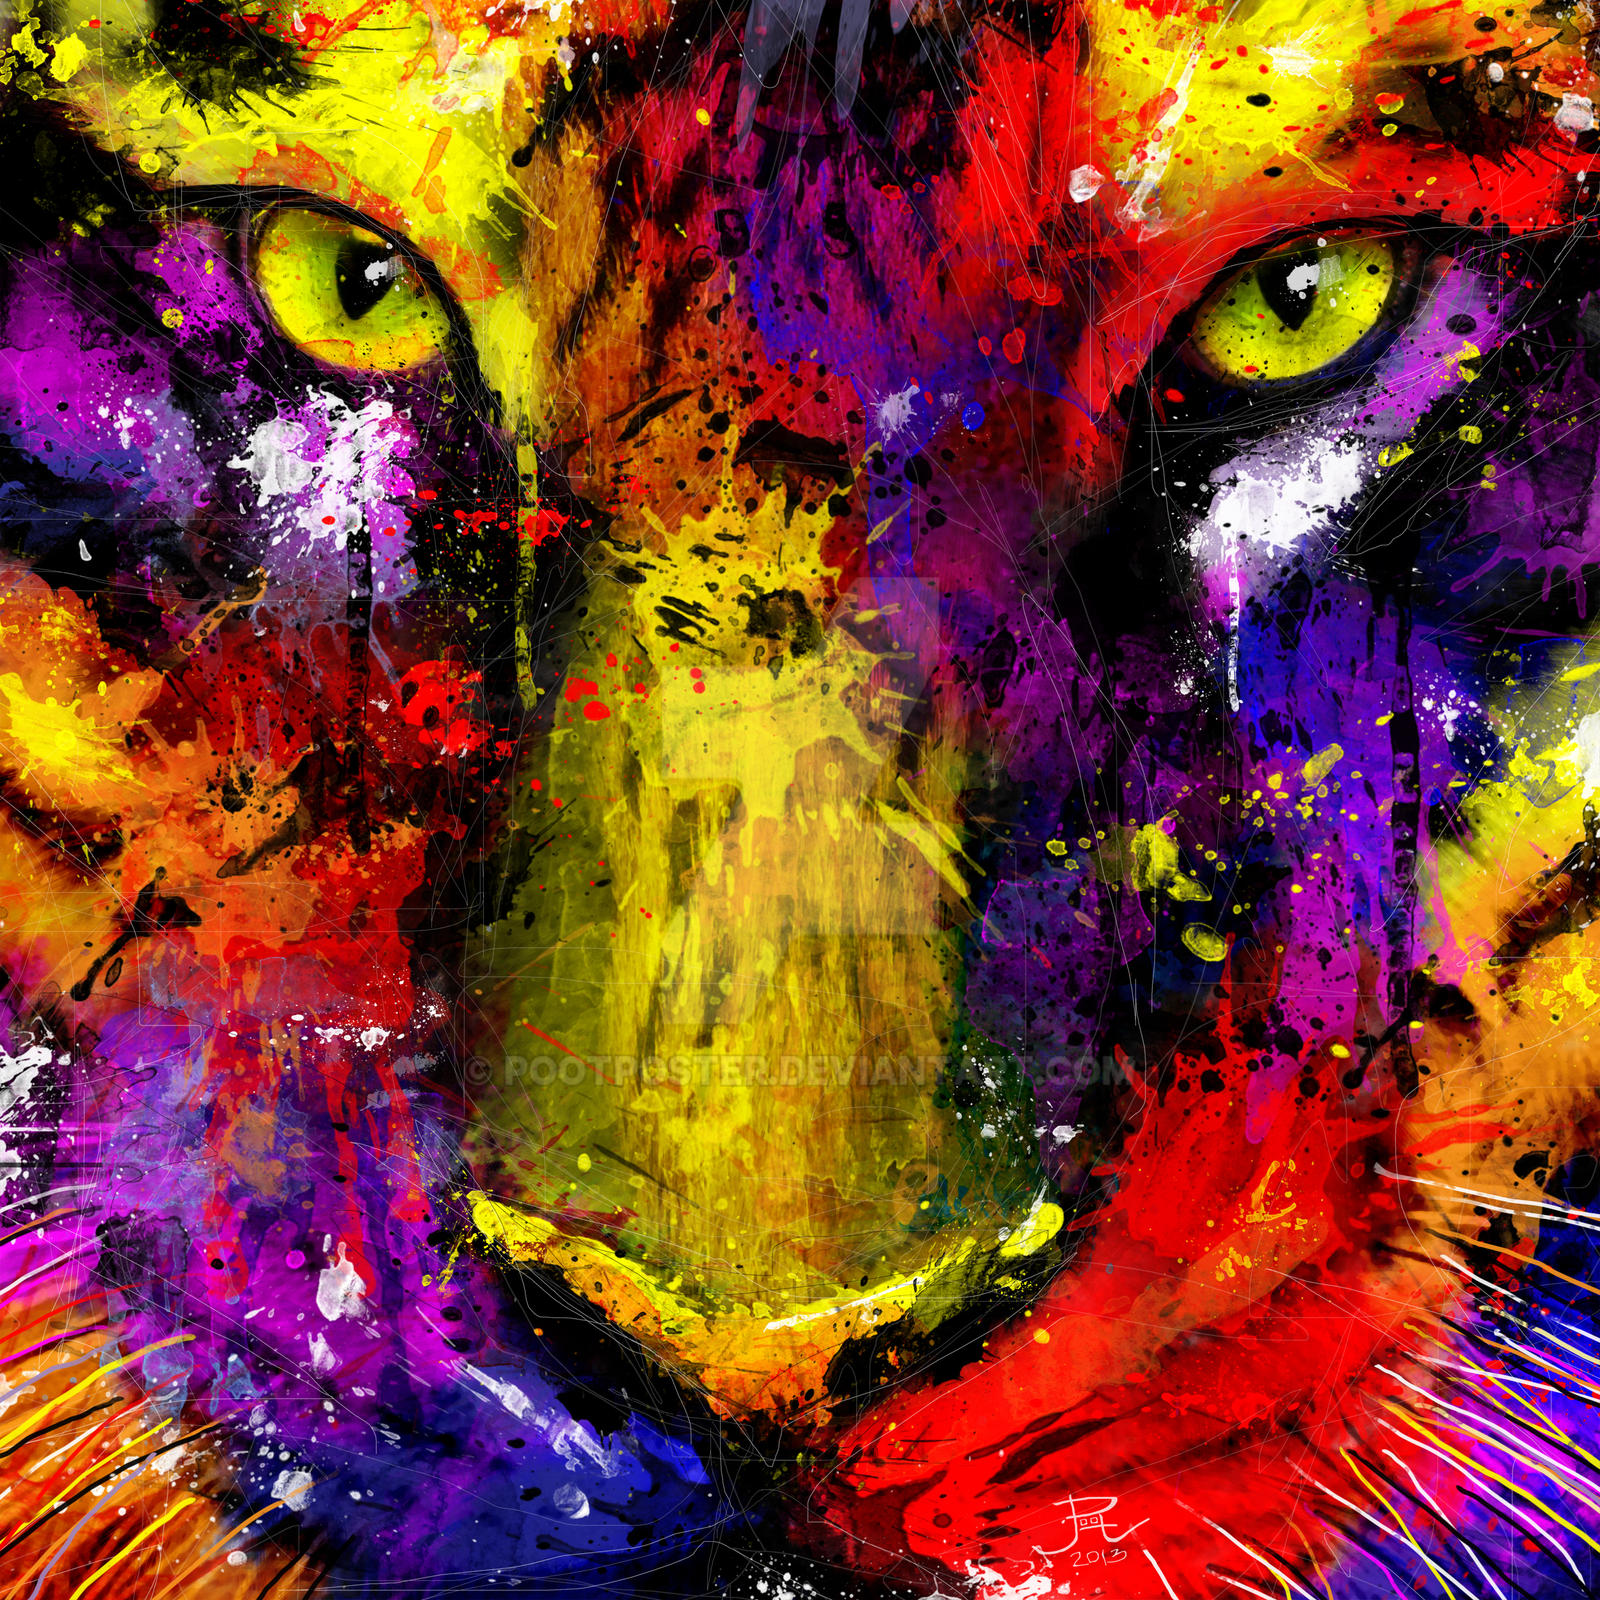 tiger pop by pootposter on deviantart